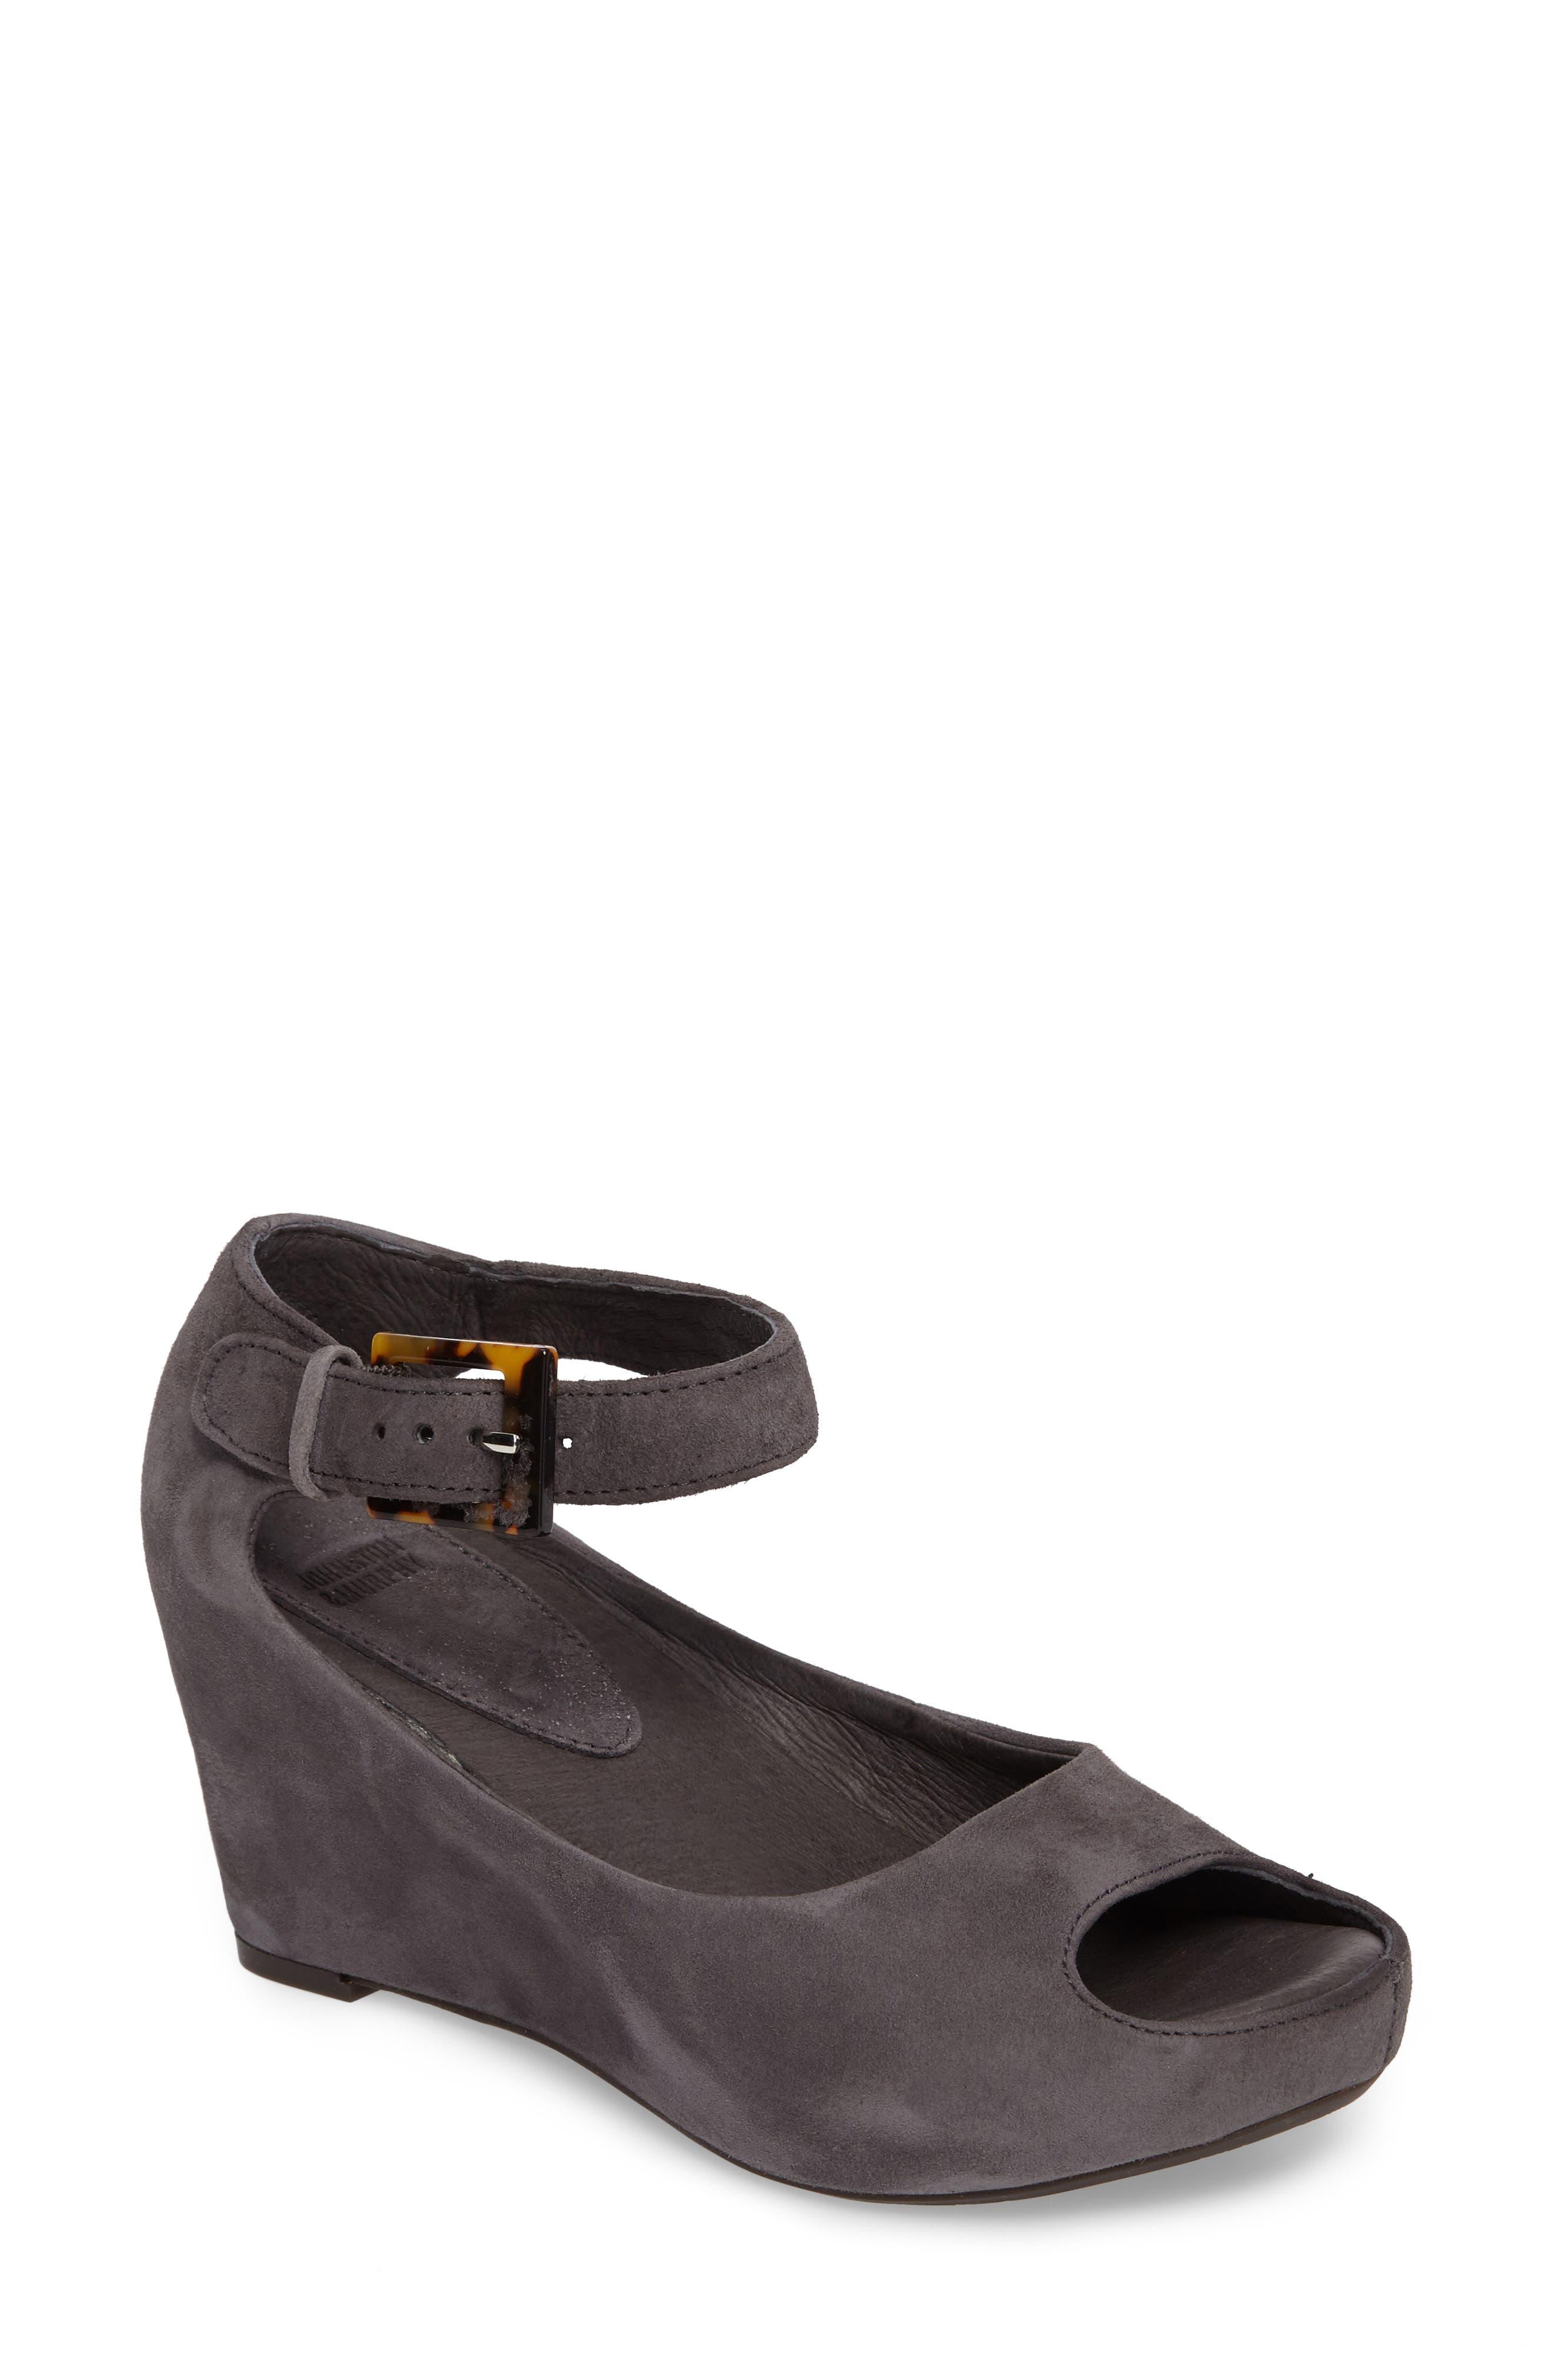 Johnston & Murphy 'Tricia' Ankle Strap Sandal